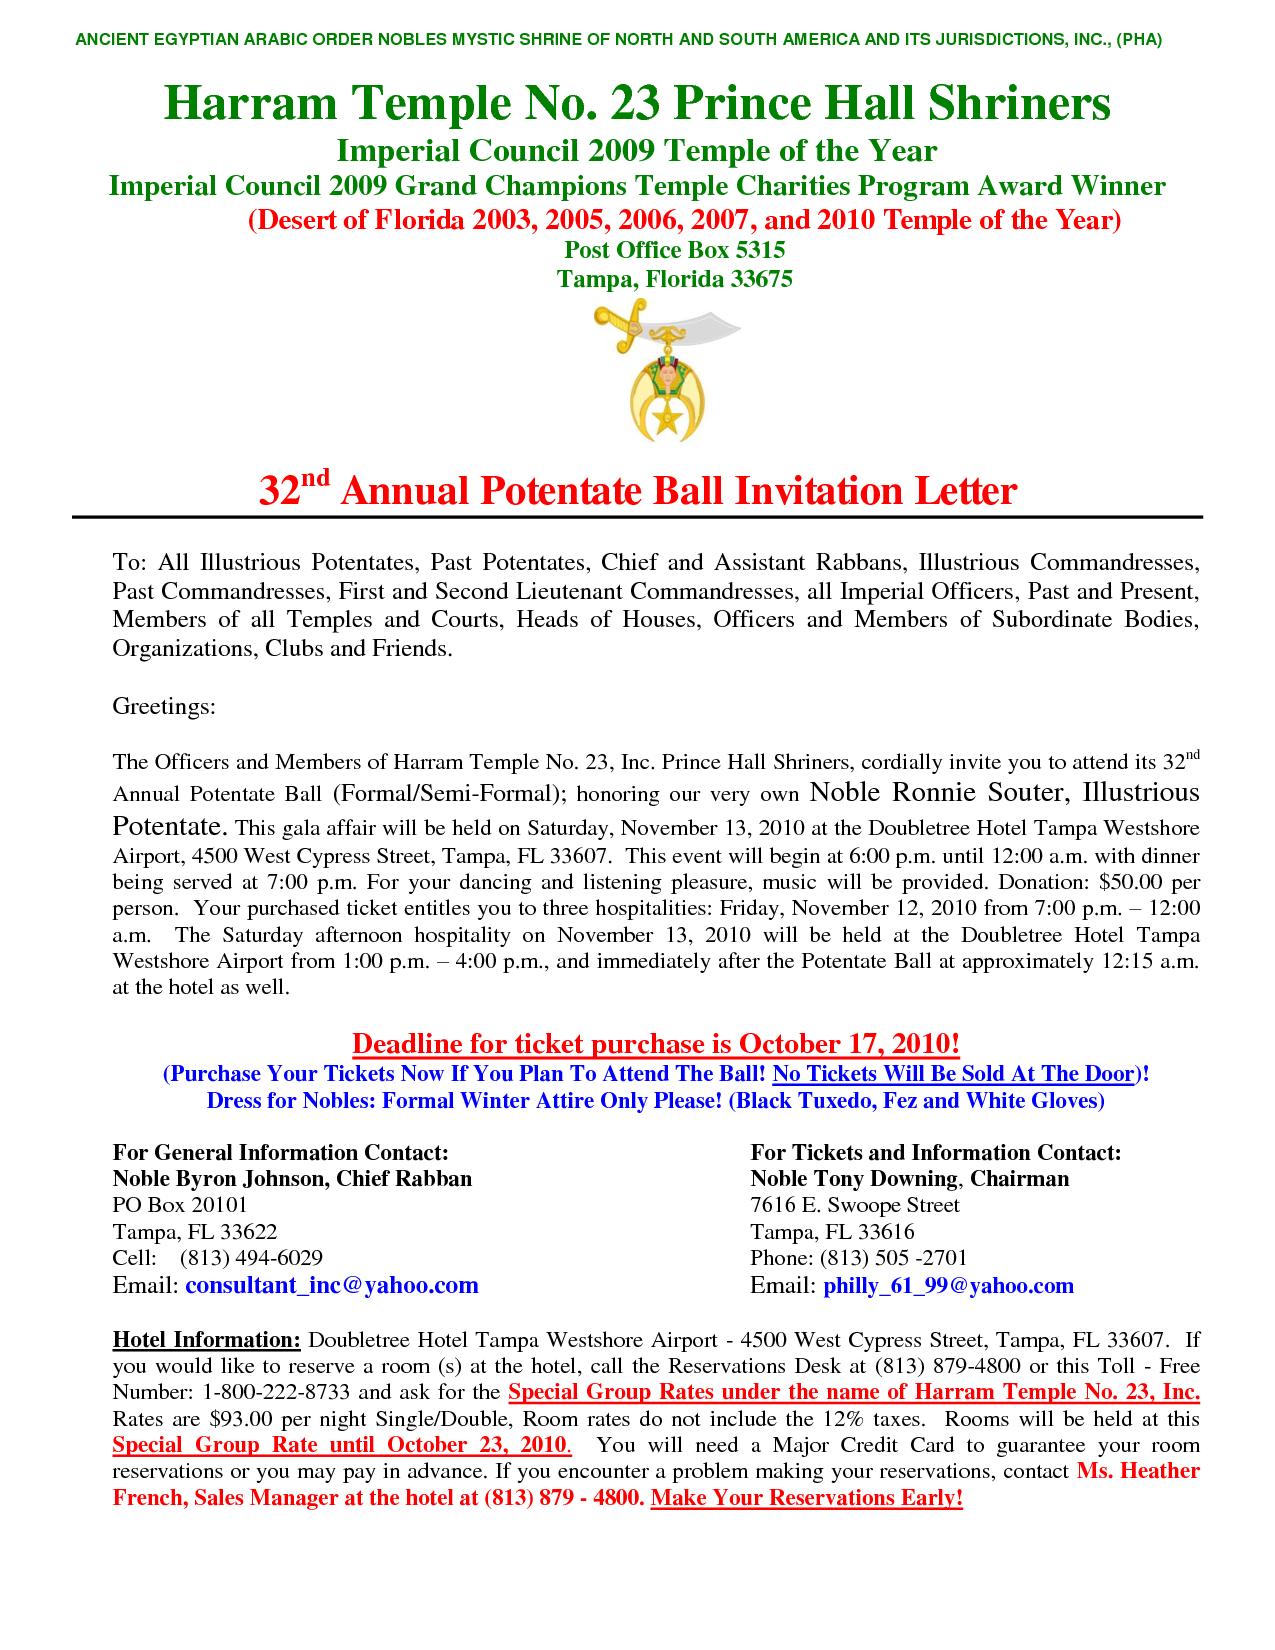 Charity Gala Invitation